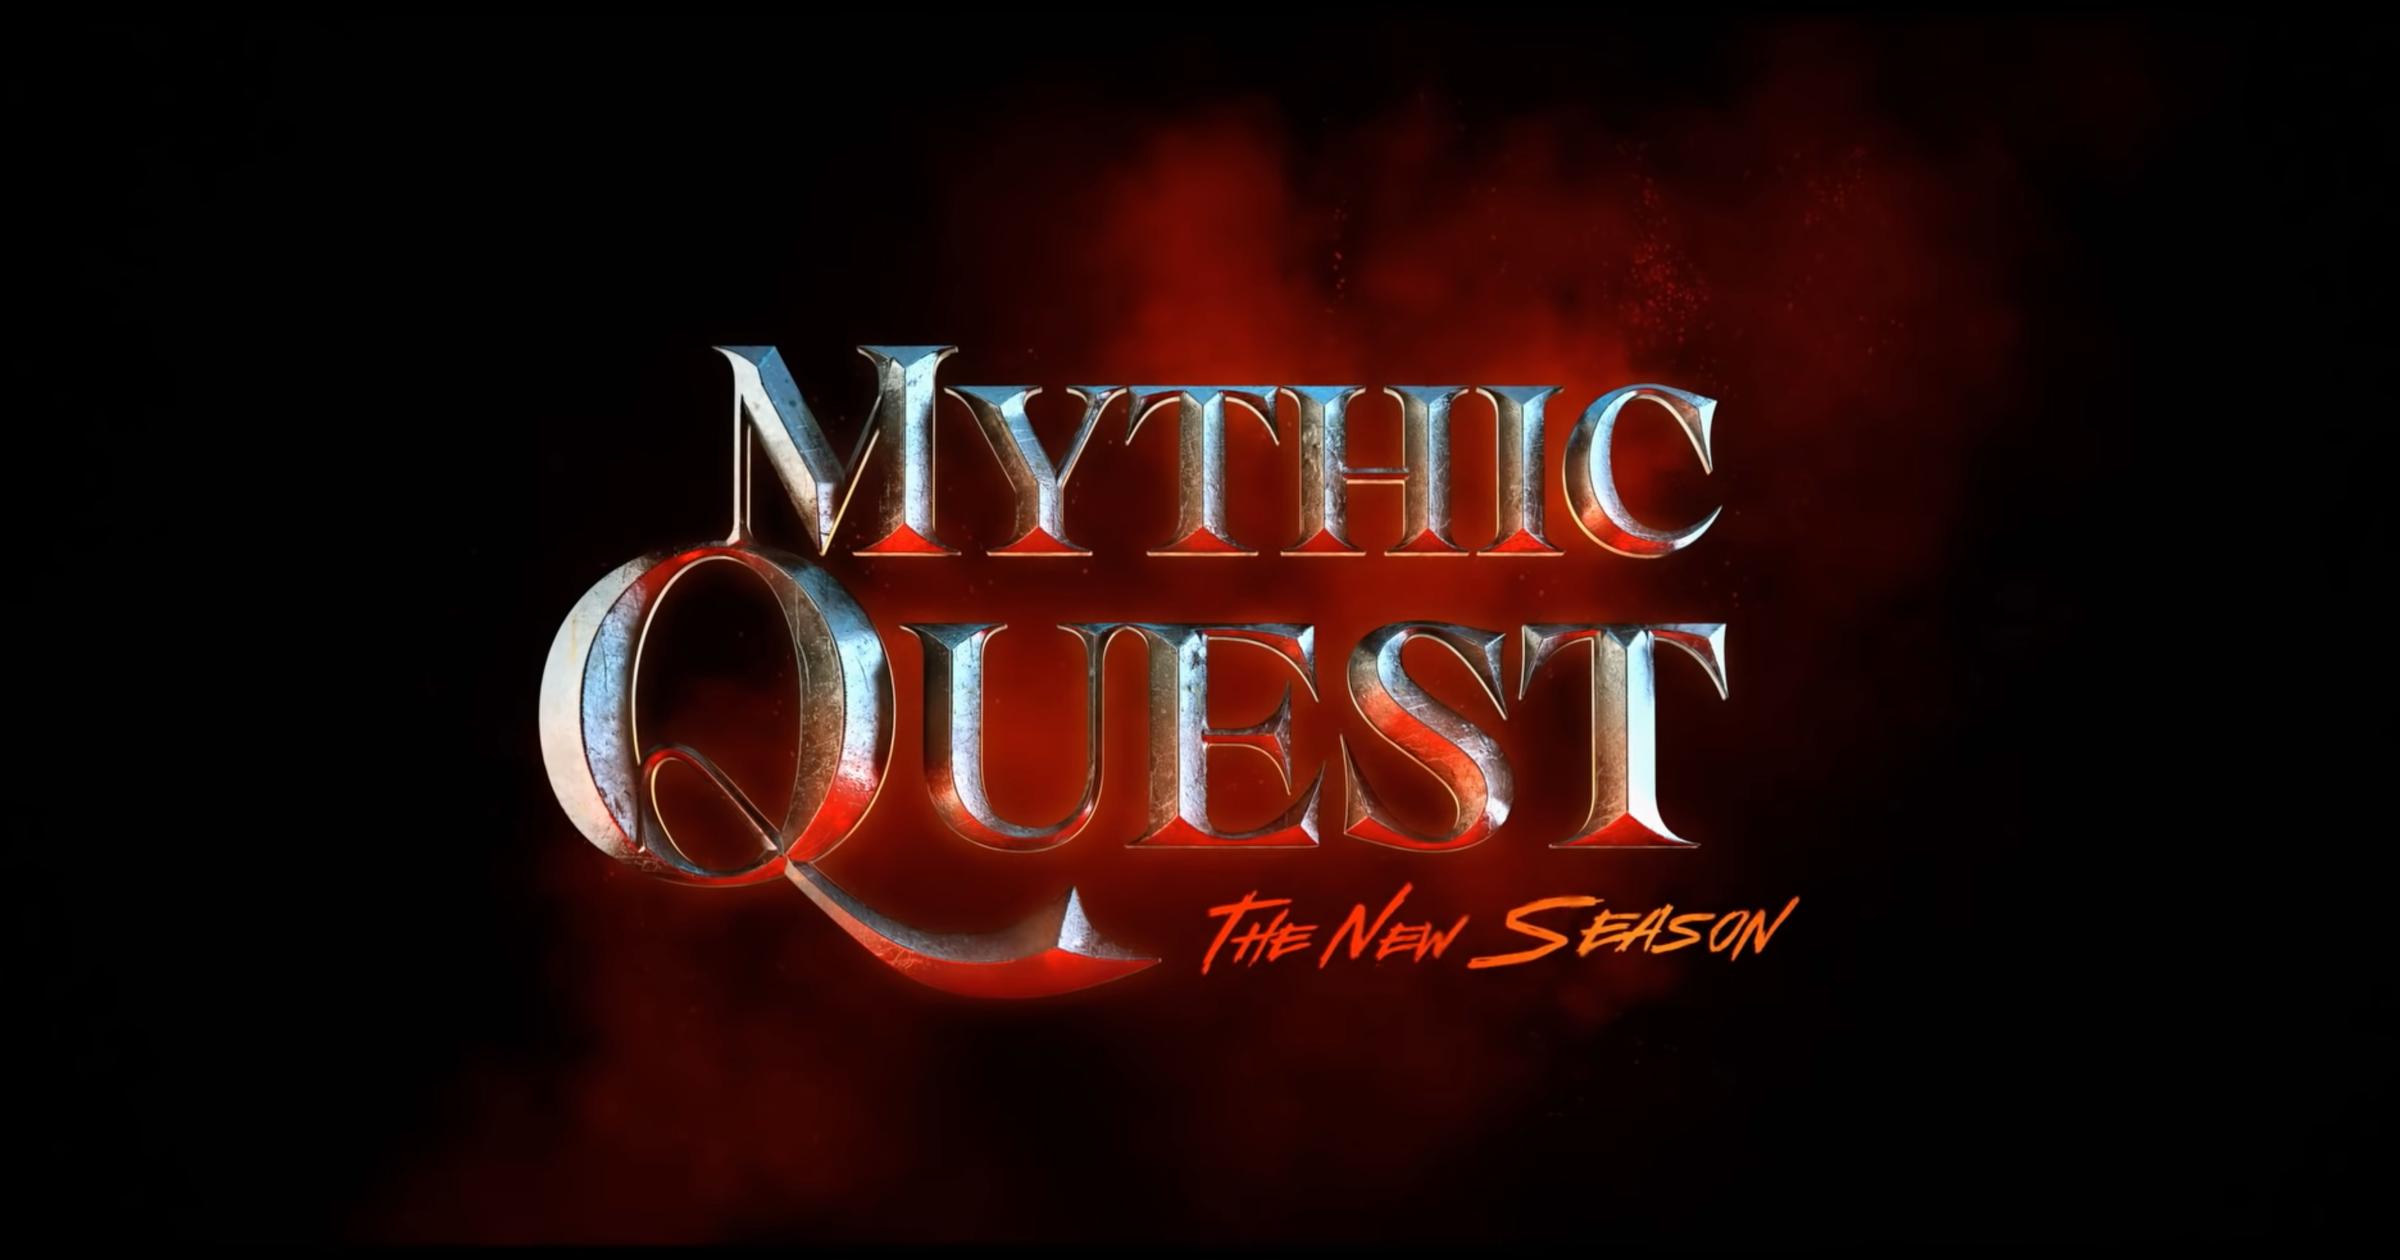 Mythic Quest new season